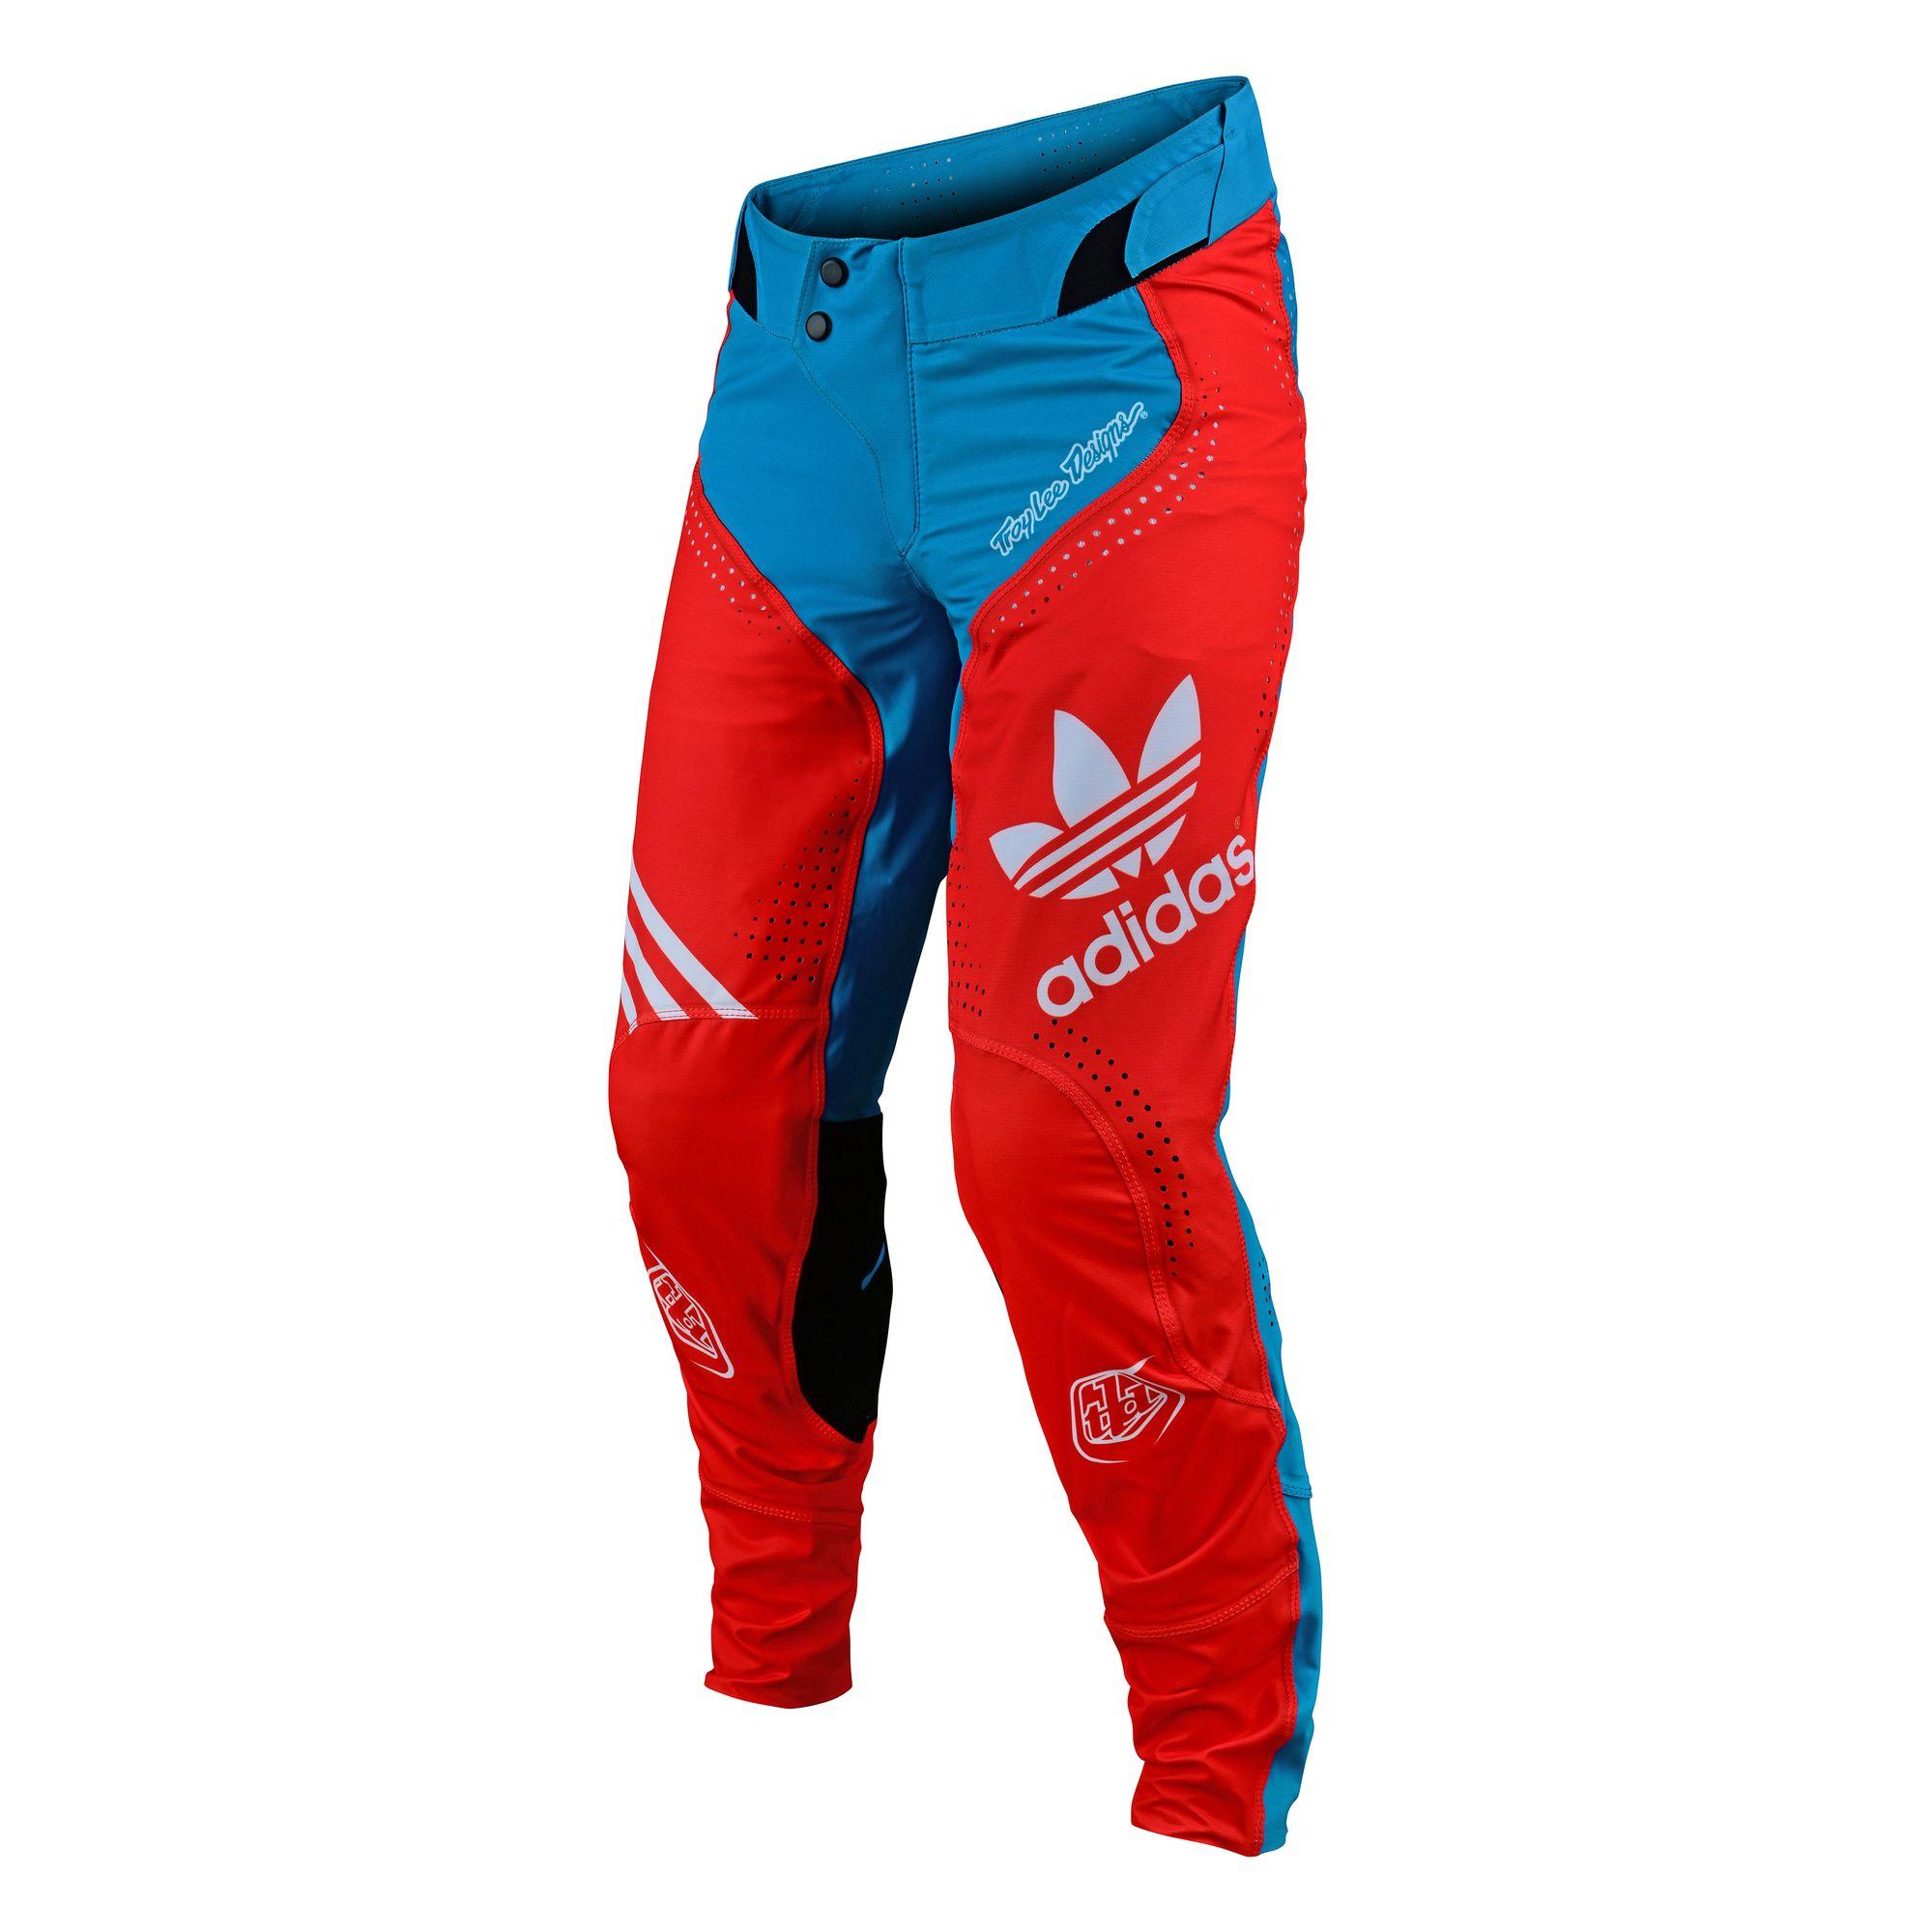 barajar Aclarar cuadrado  Troy Lee SE Ultra 2020 Limited Edition Adidas Motocross Pants from  Dirtbikebitz